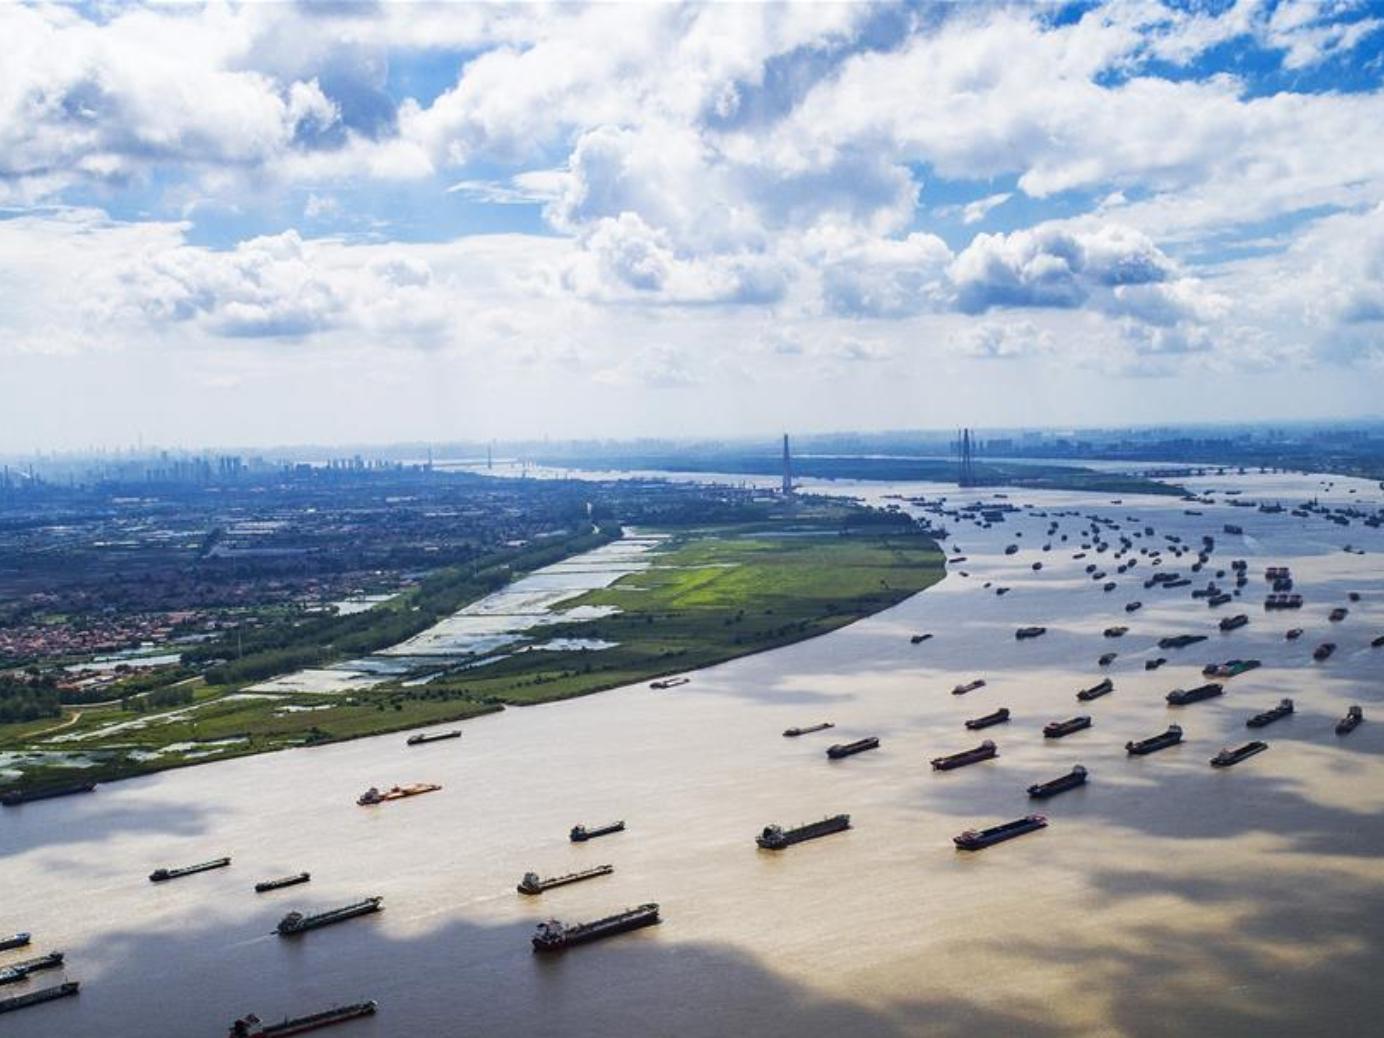 China's top legislature mulls 10-year ban on Yangtze fishing